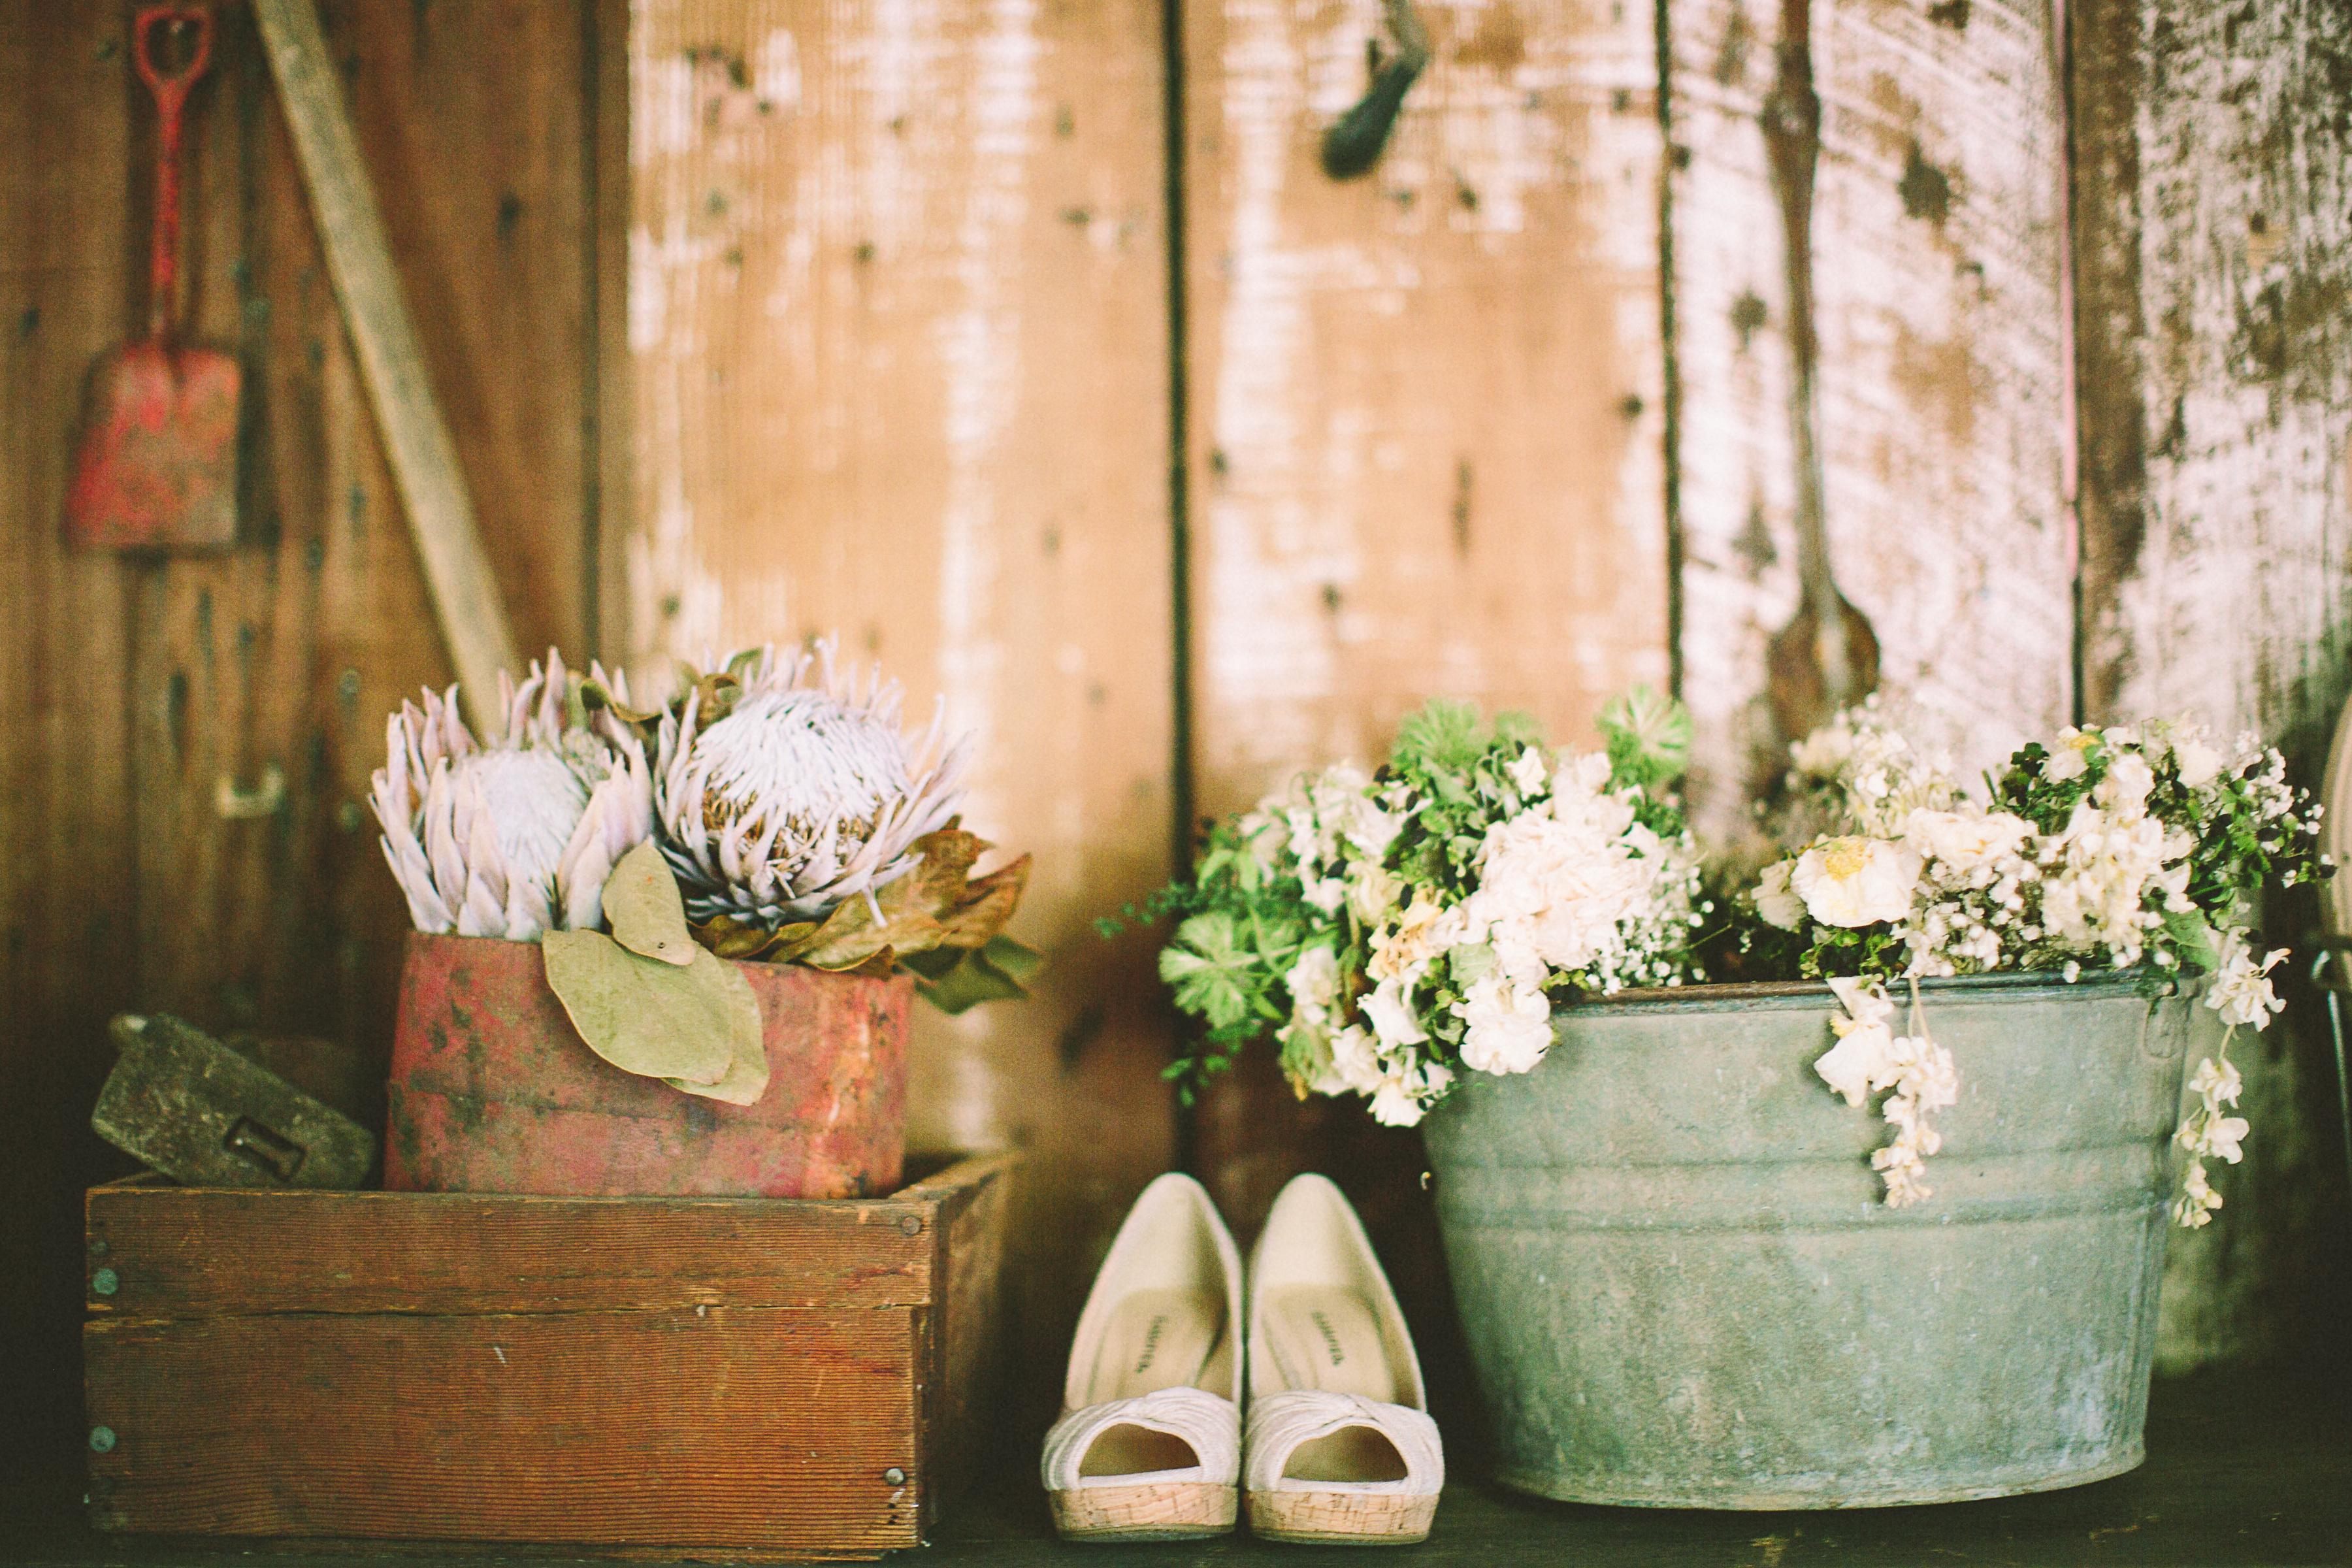 houckwedding-34 Garden Wedding at the Inn at Park Winters wedding